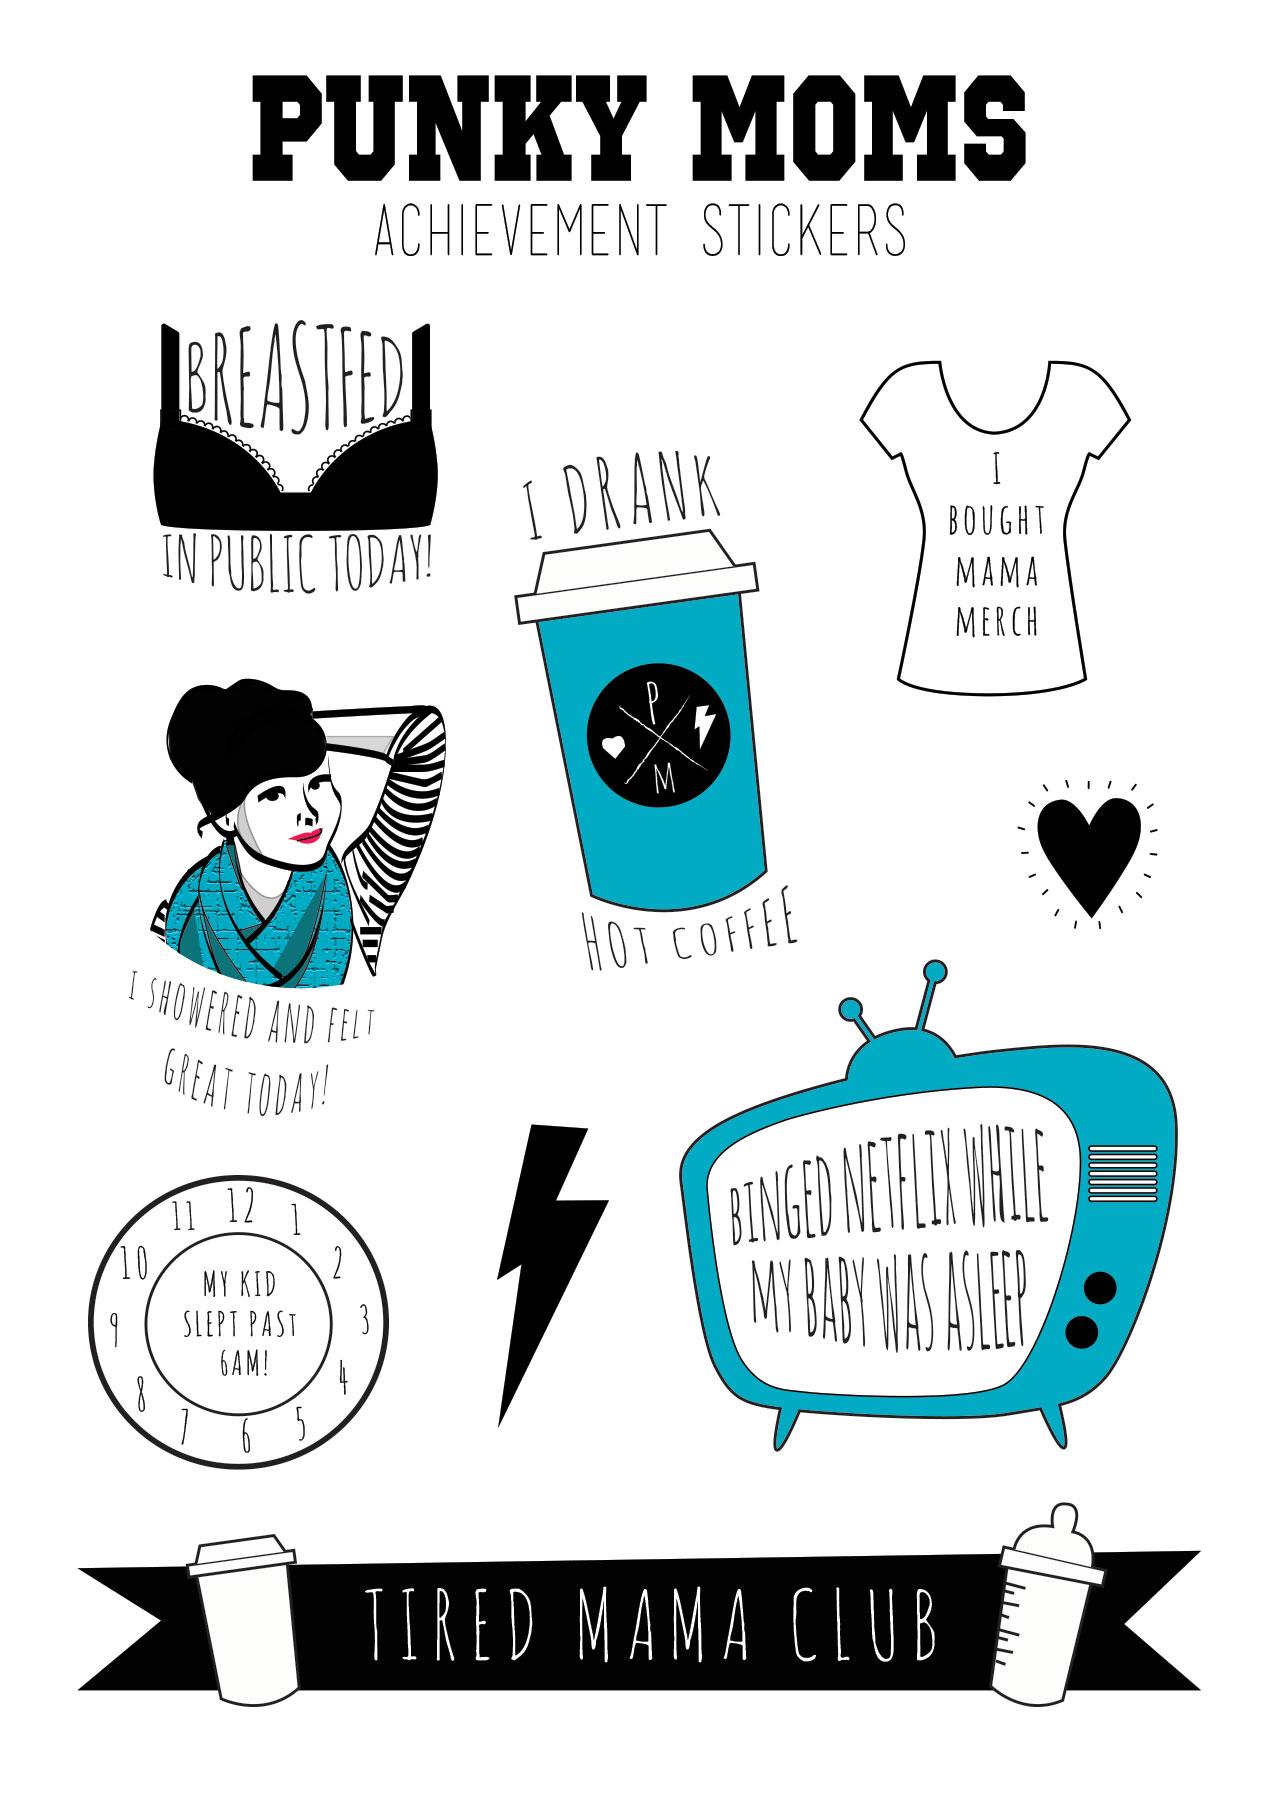 Team No Sleep - Tired Mama Club Stickers - Punky Moms Achievement Stickers